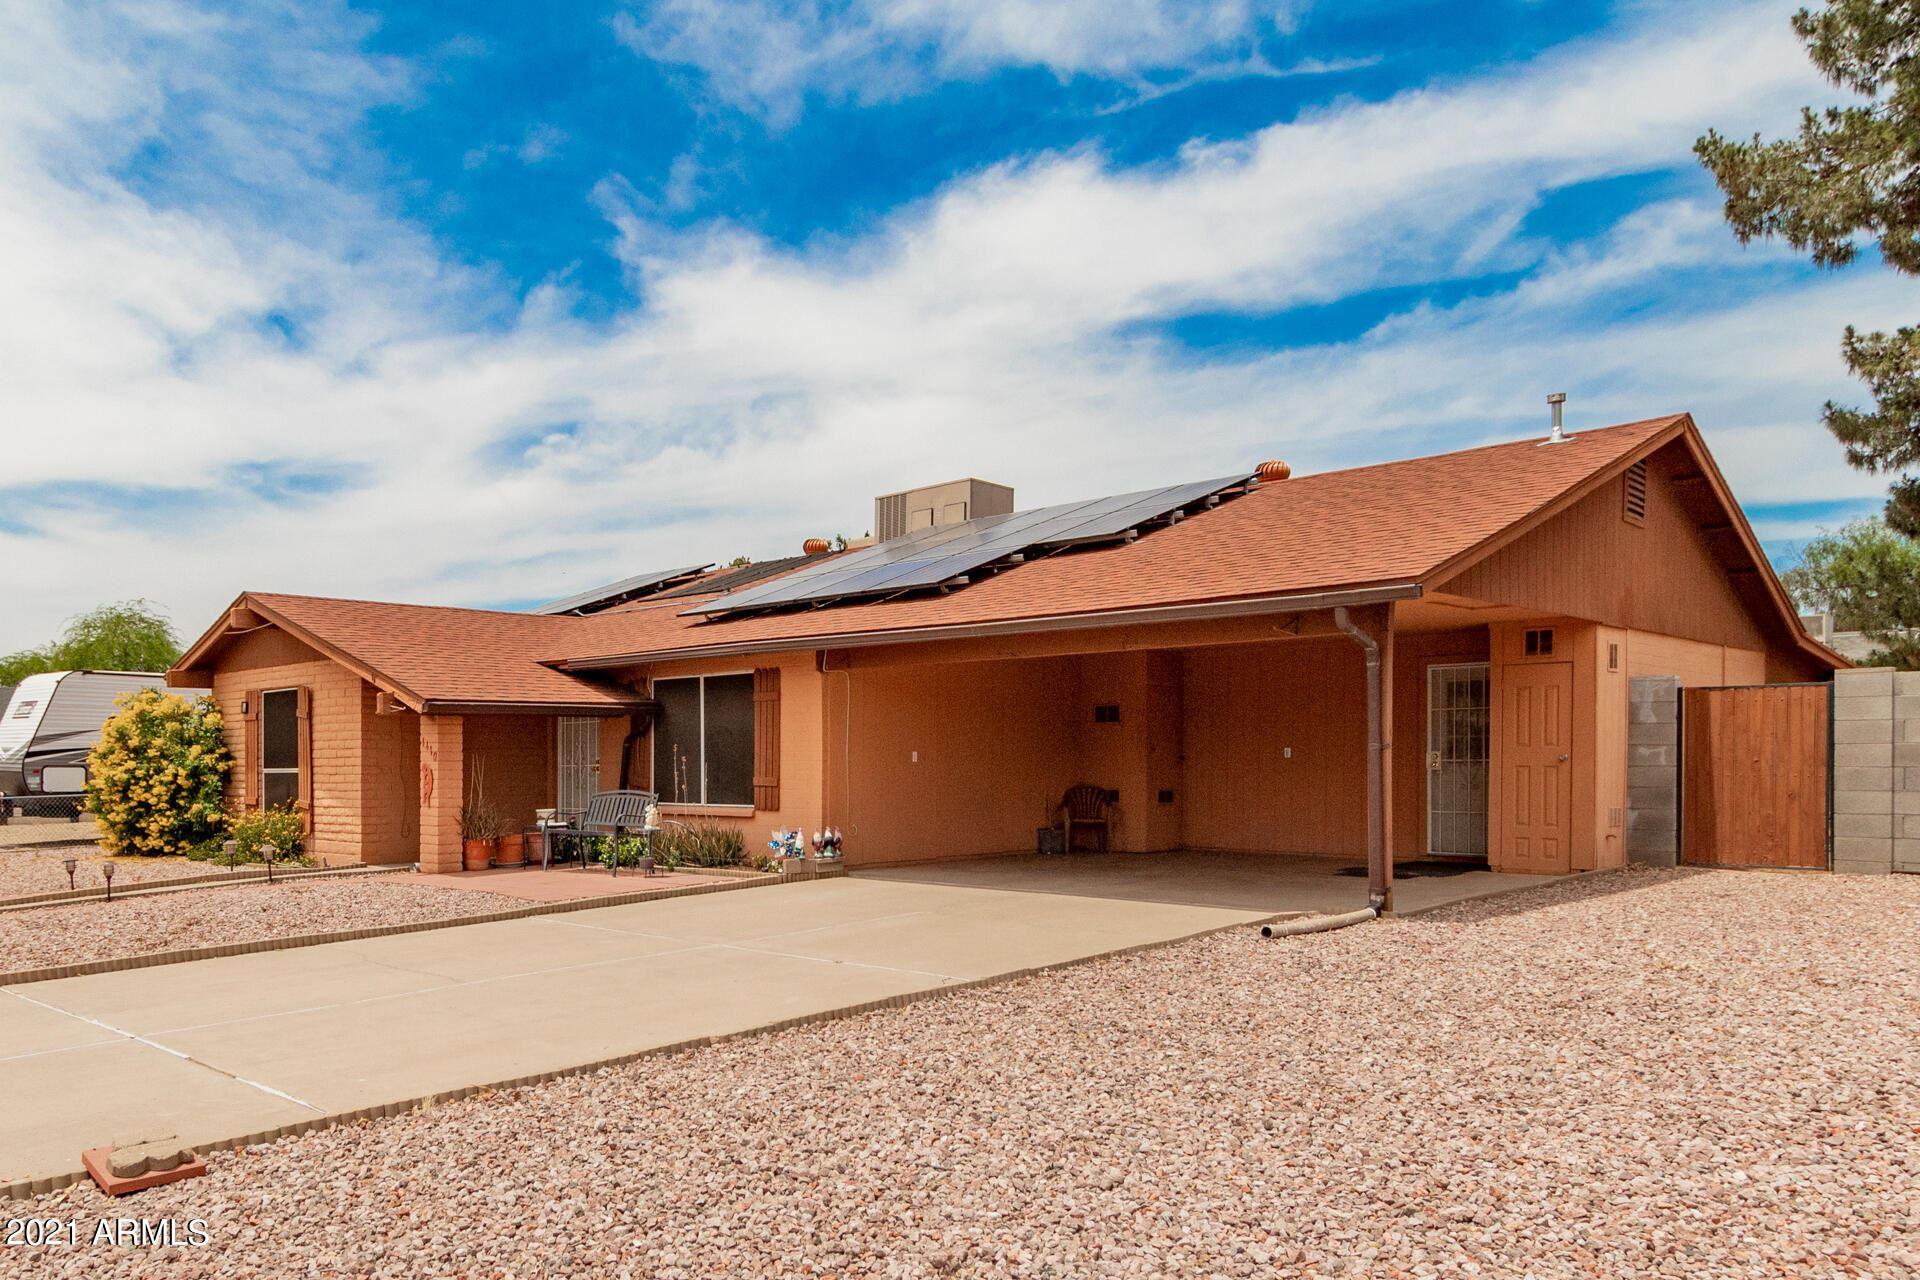 1410 W RENEE Drive, Phoenix, AZ 85027 - MLS#: 6240476